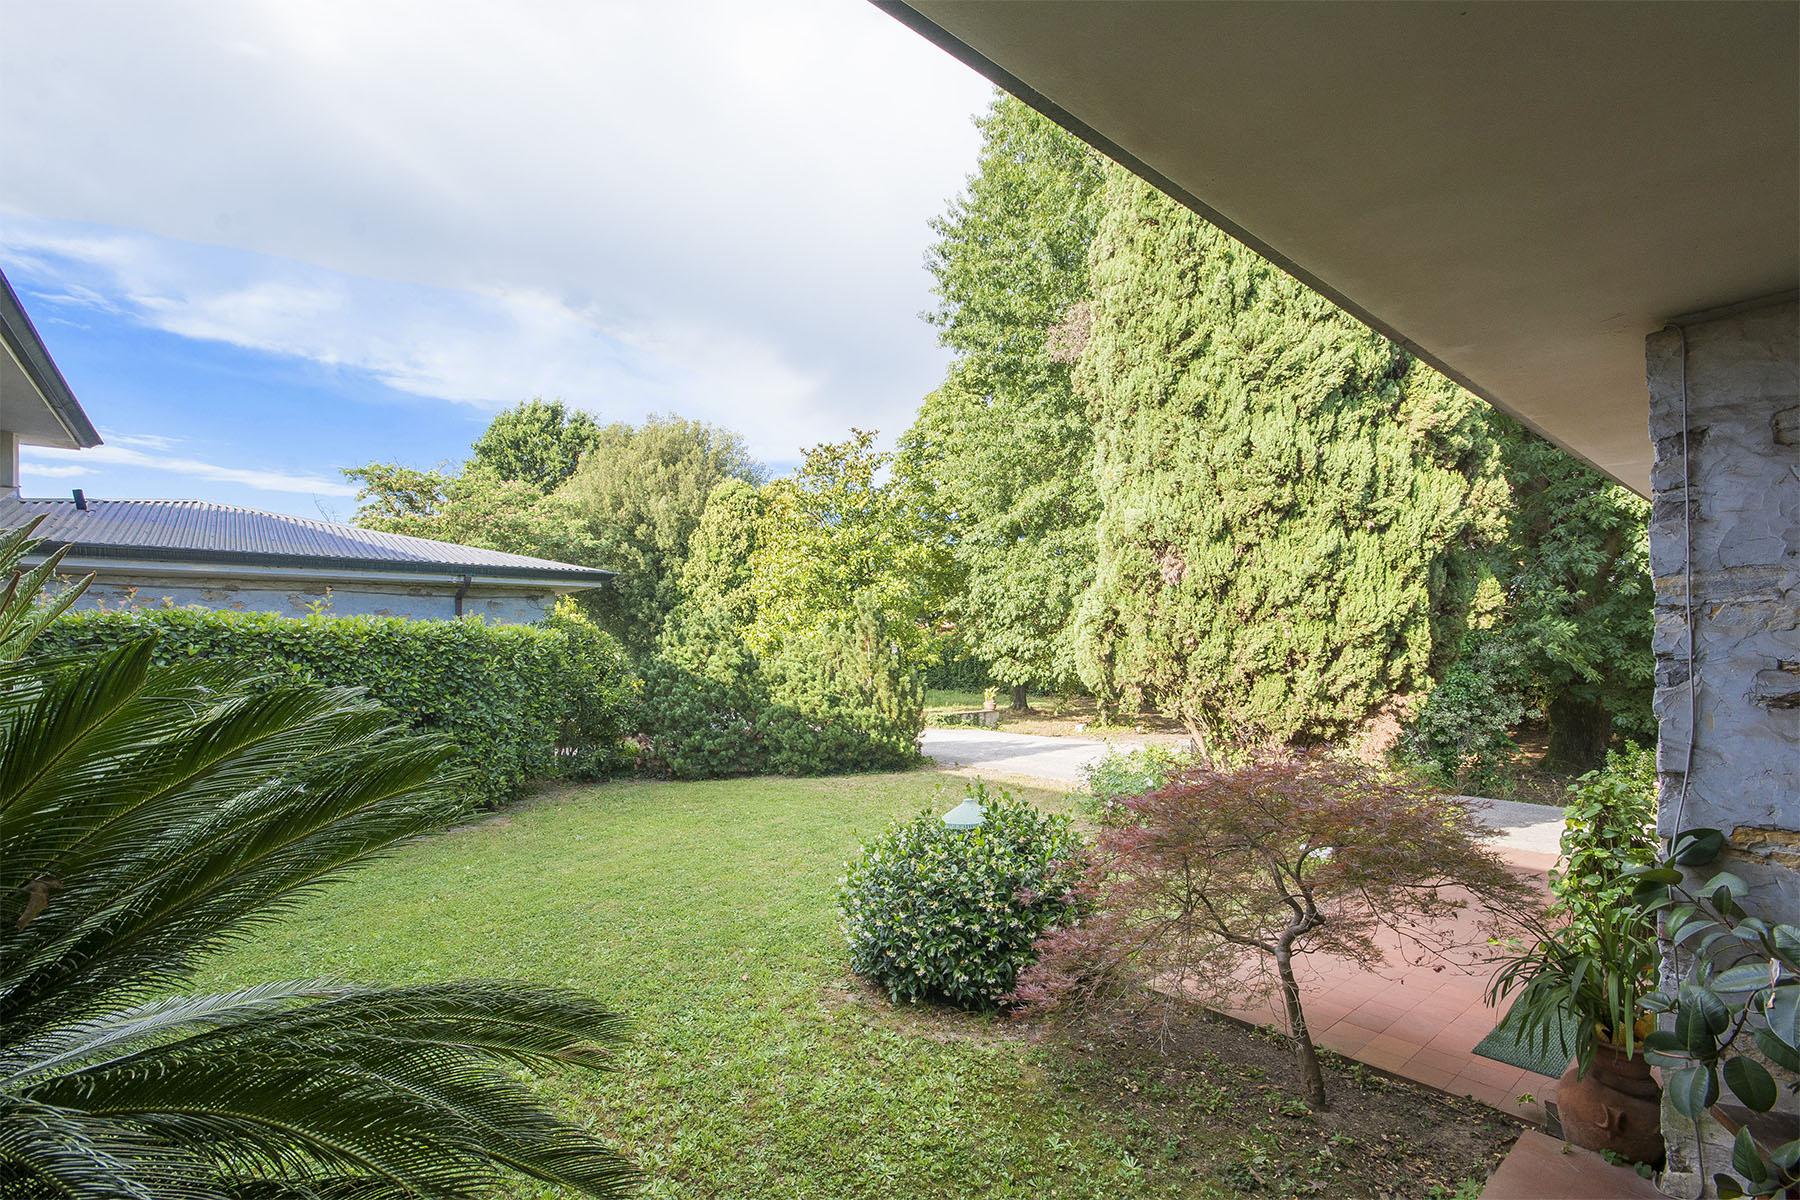 Villa in Vendita a Capannori: 5 locali, 500 mq - Foto 20